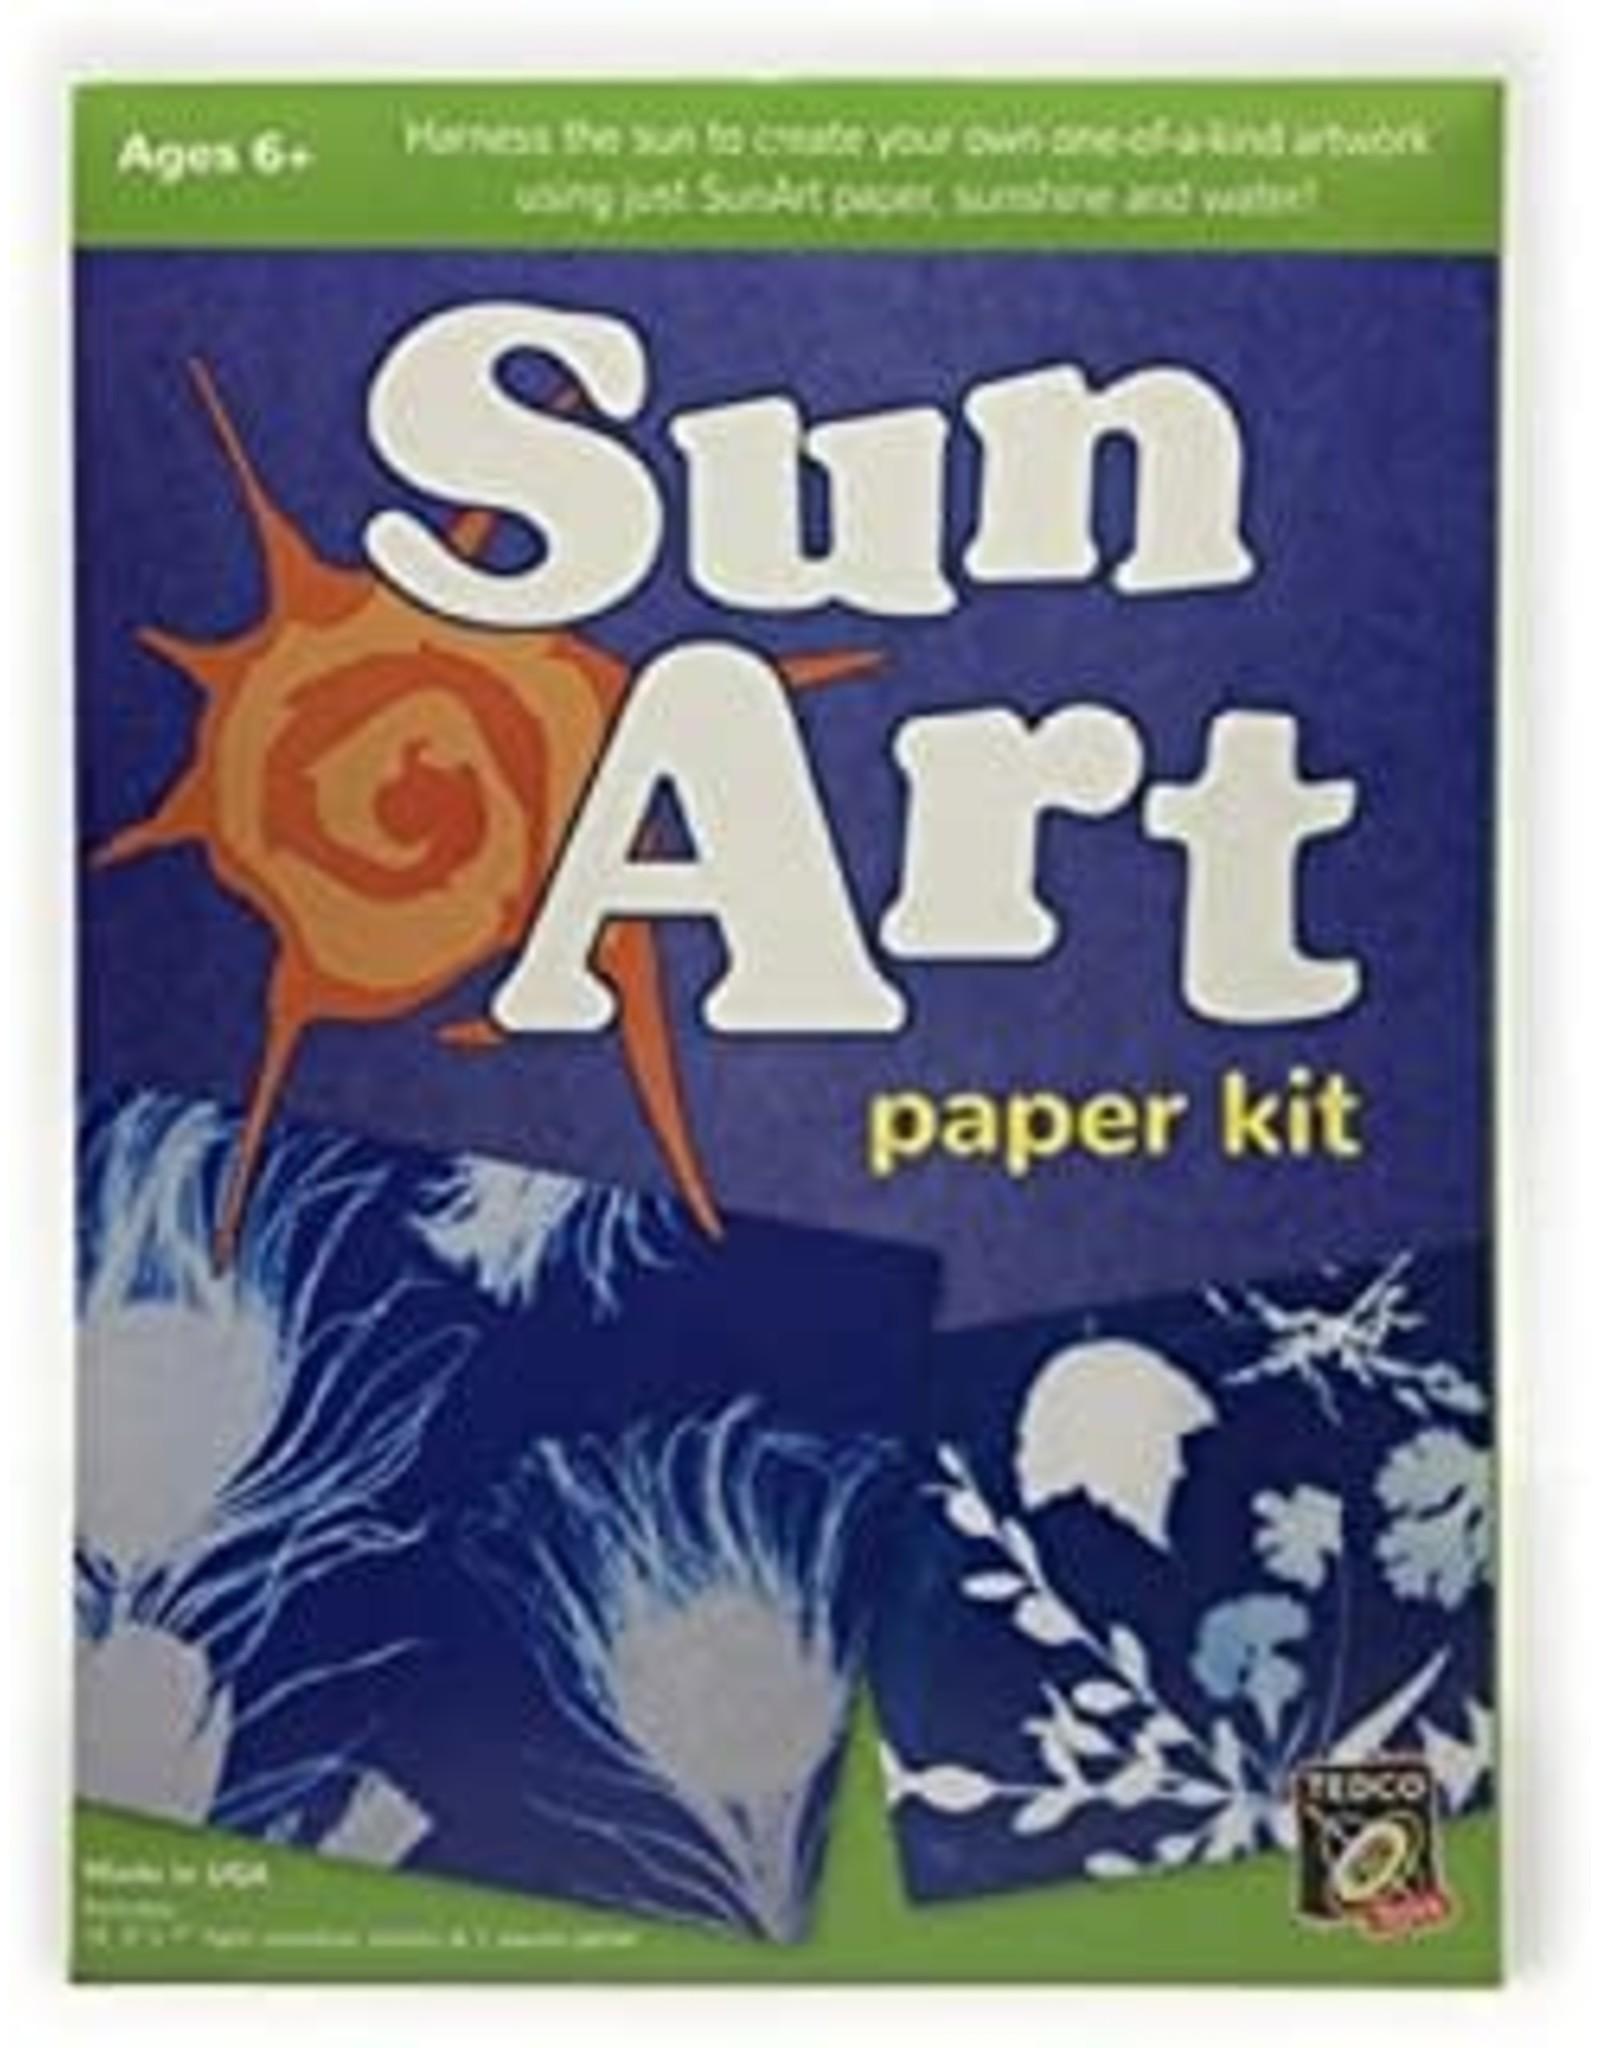 Tedco toys 88051 SunArt Paper Kit 5x7